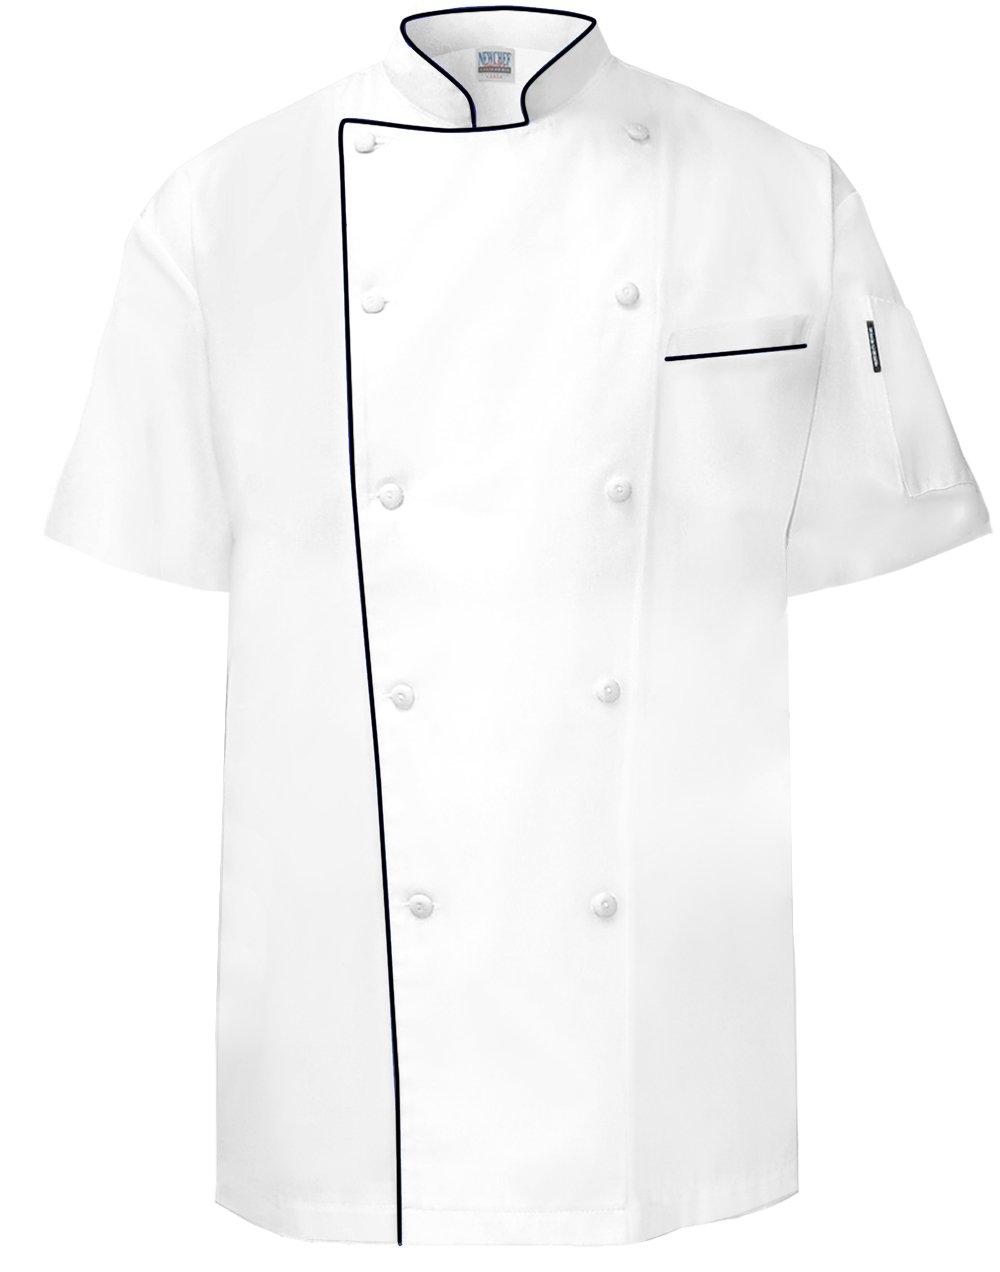 Newchef Fashion VIP Chef Coat Short Sleeves Black Trim L White by Newchef Fashion